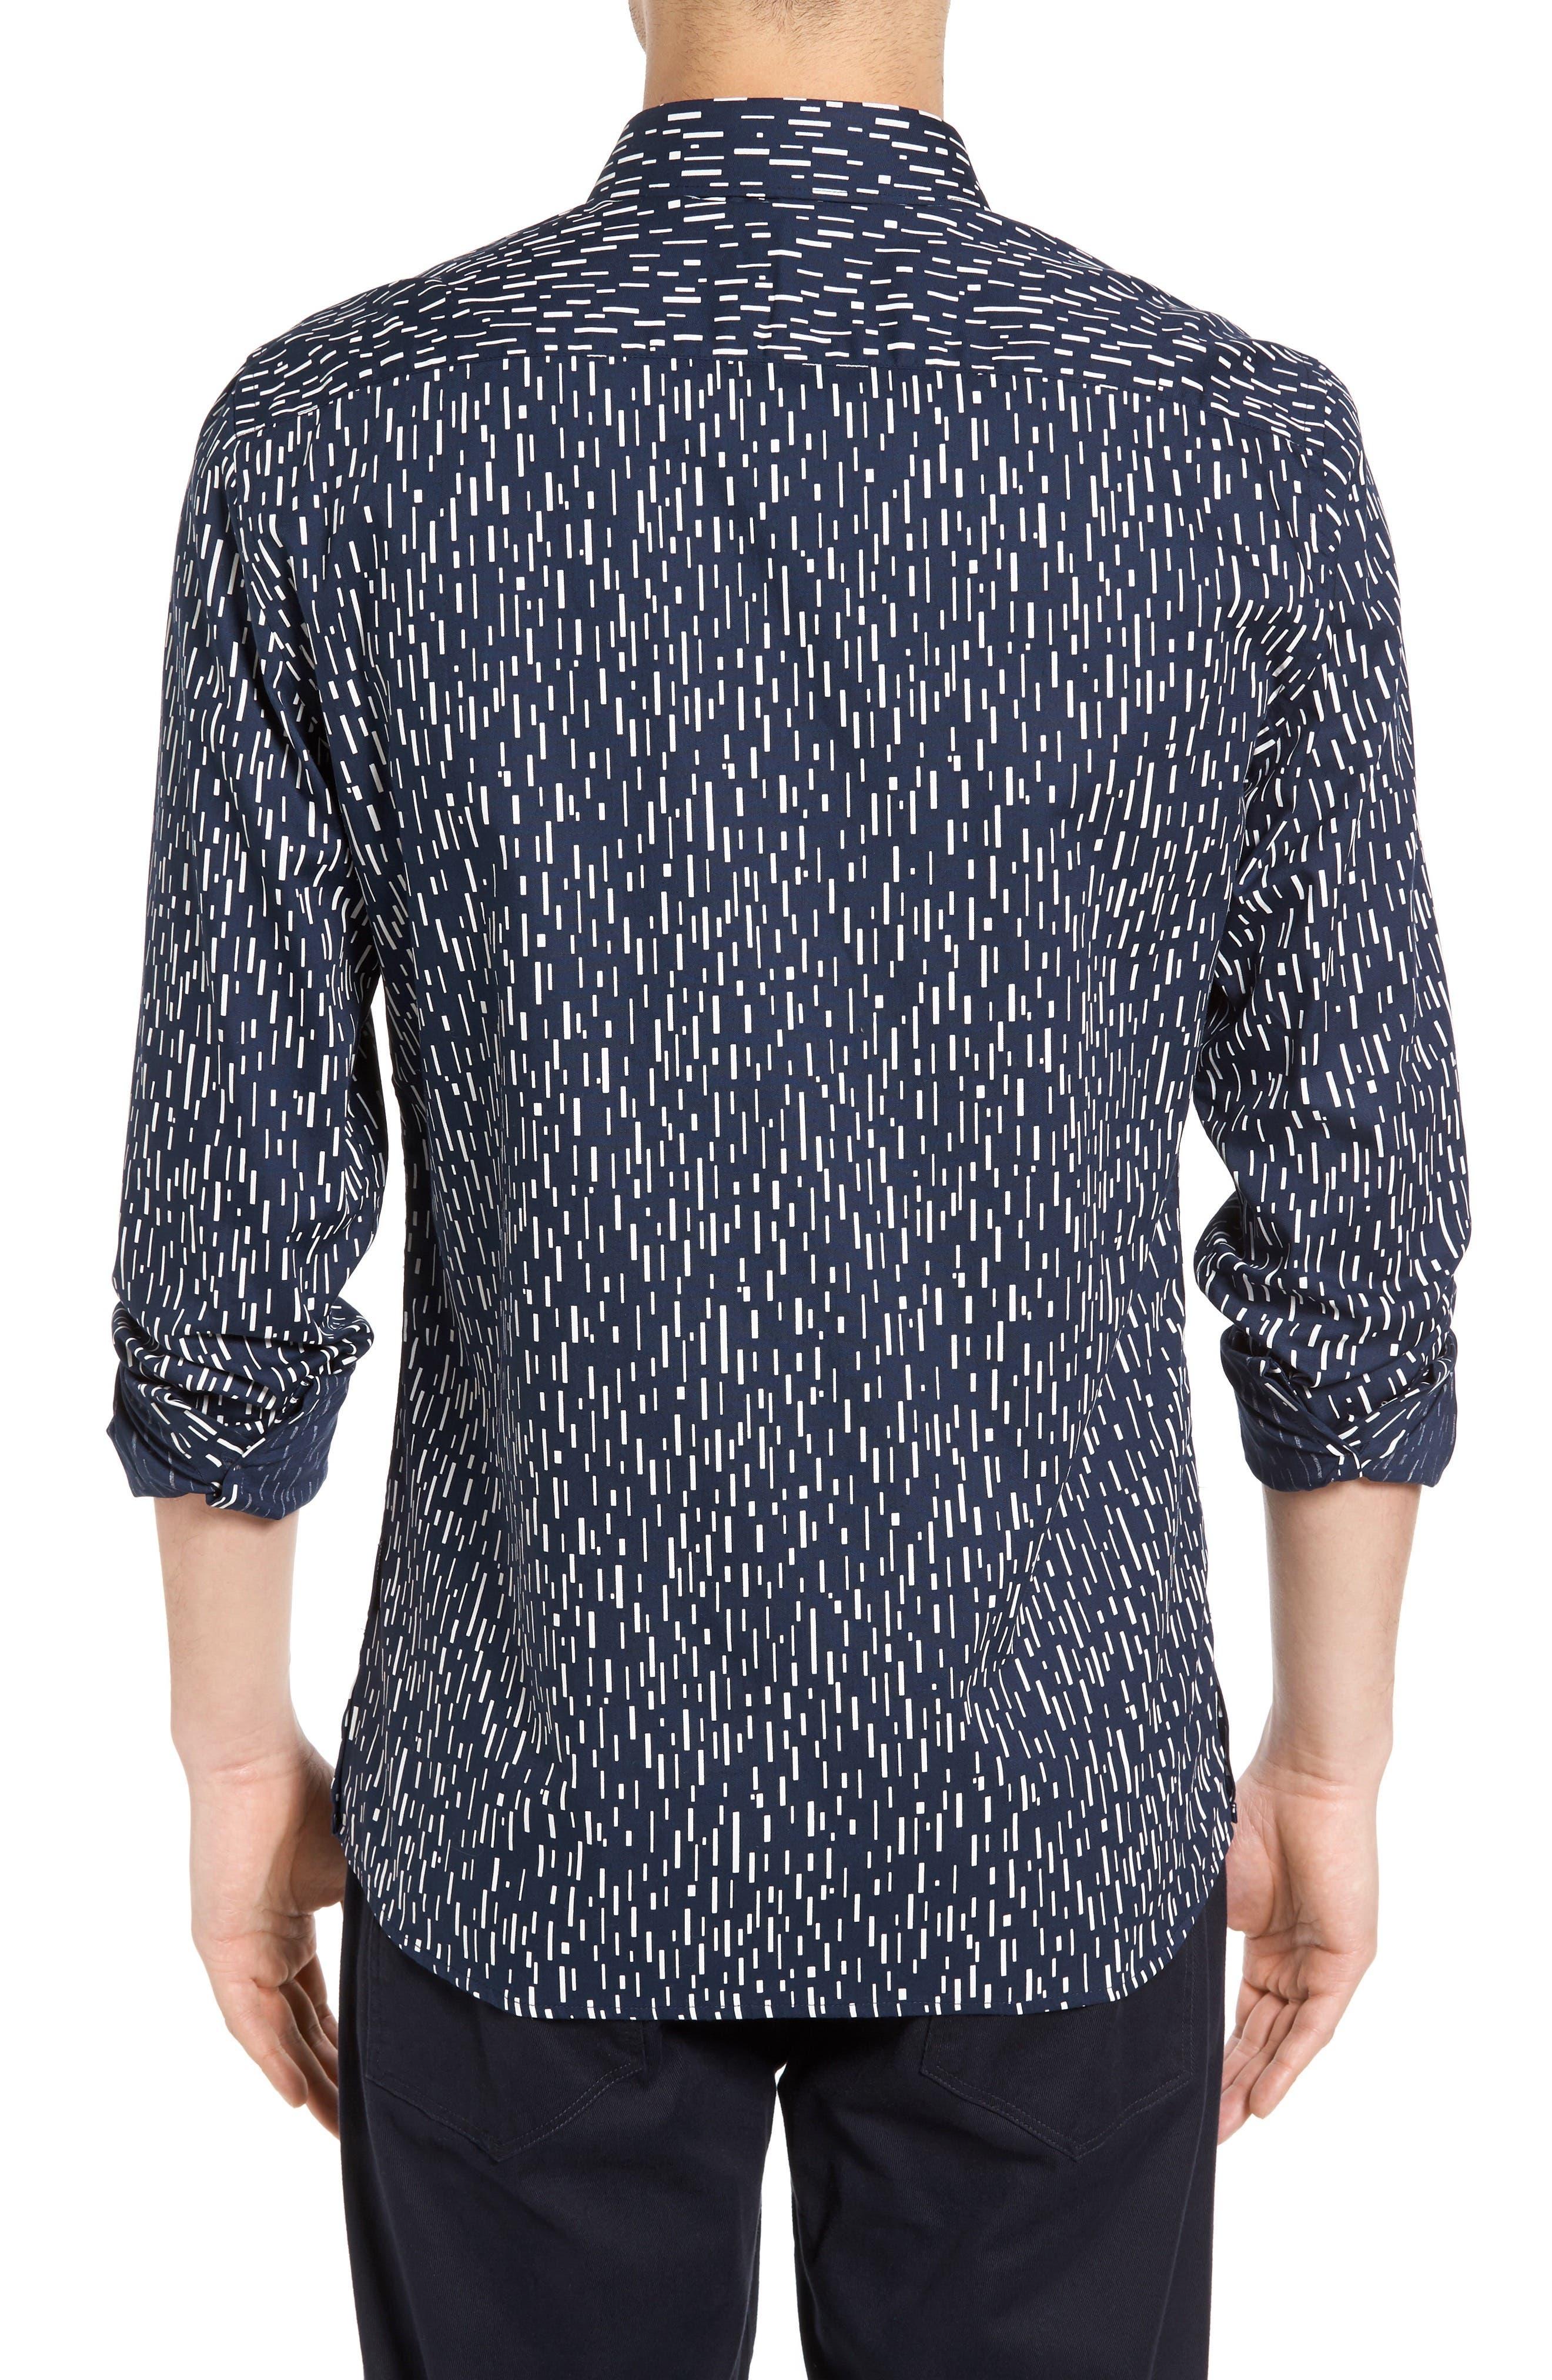 Rain Dash Slim Fit Oxford Shirt,                             Alternate thumbnail 2, color,                             Marine Blue/ White